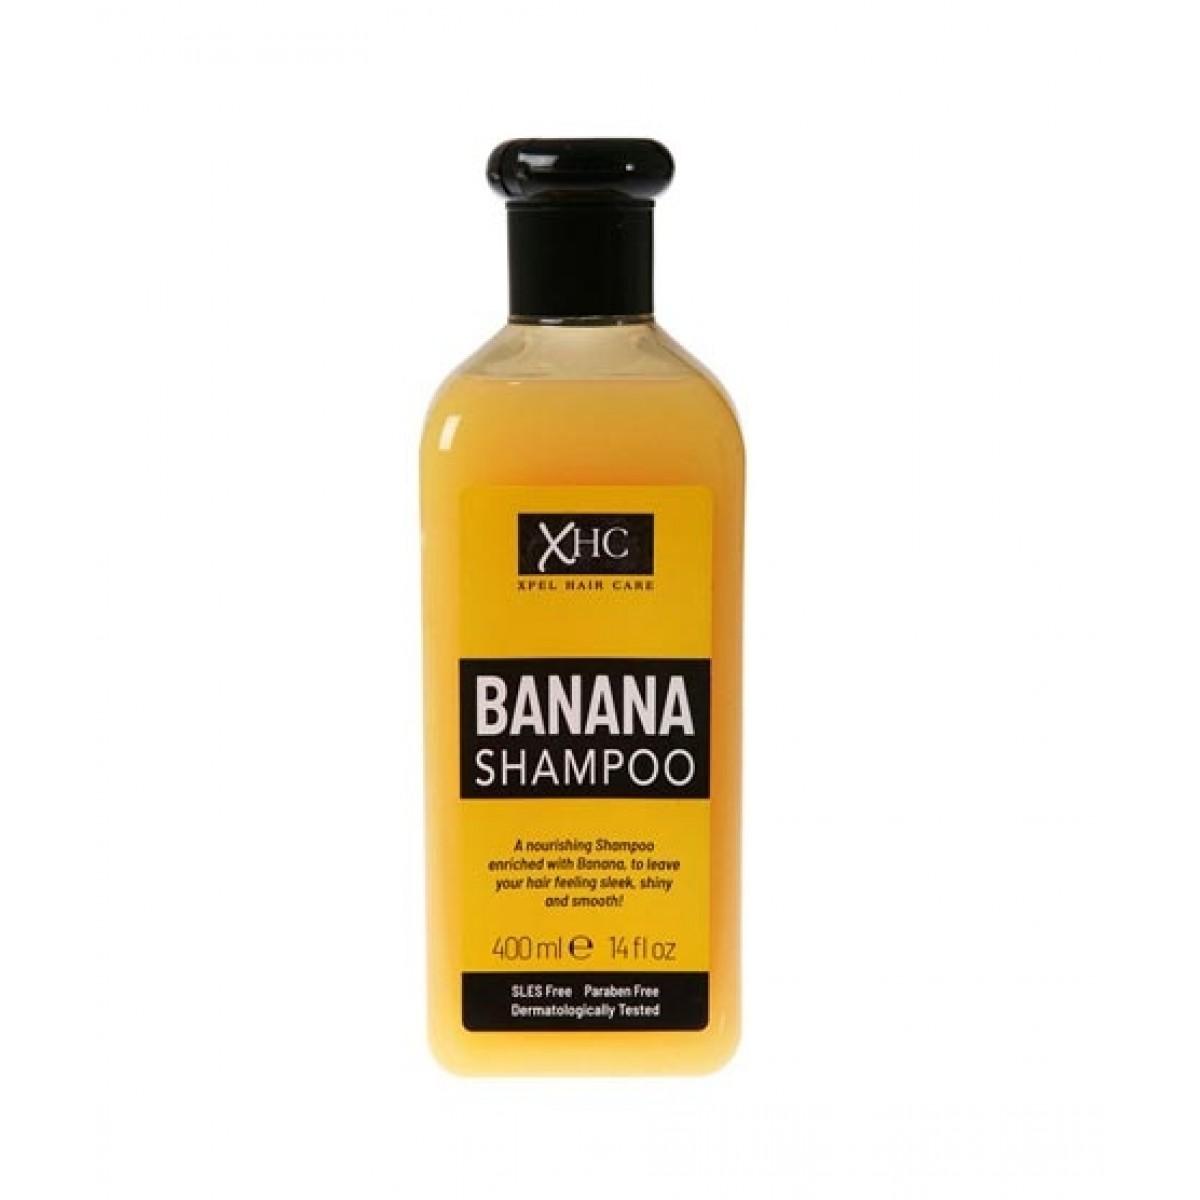 XHC Hair Care Banana Shampoo 400ml